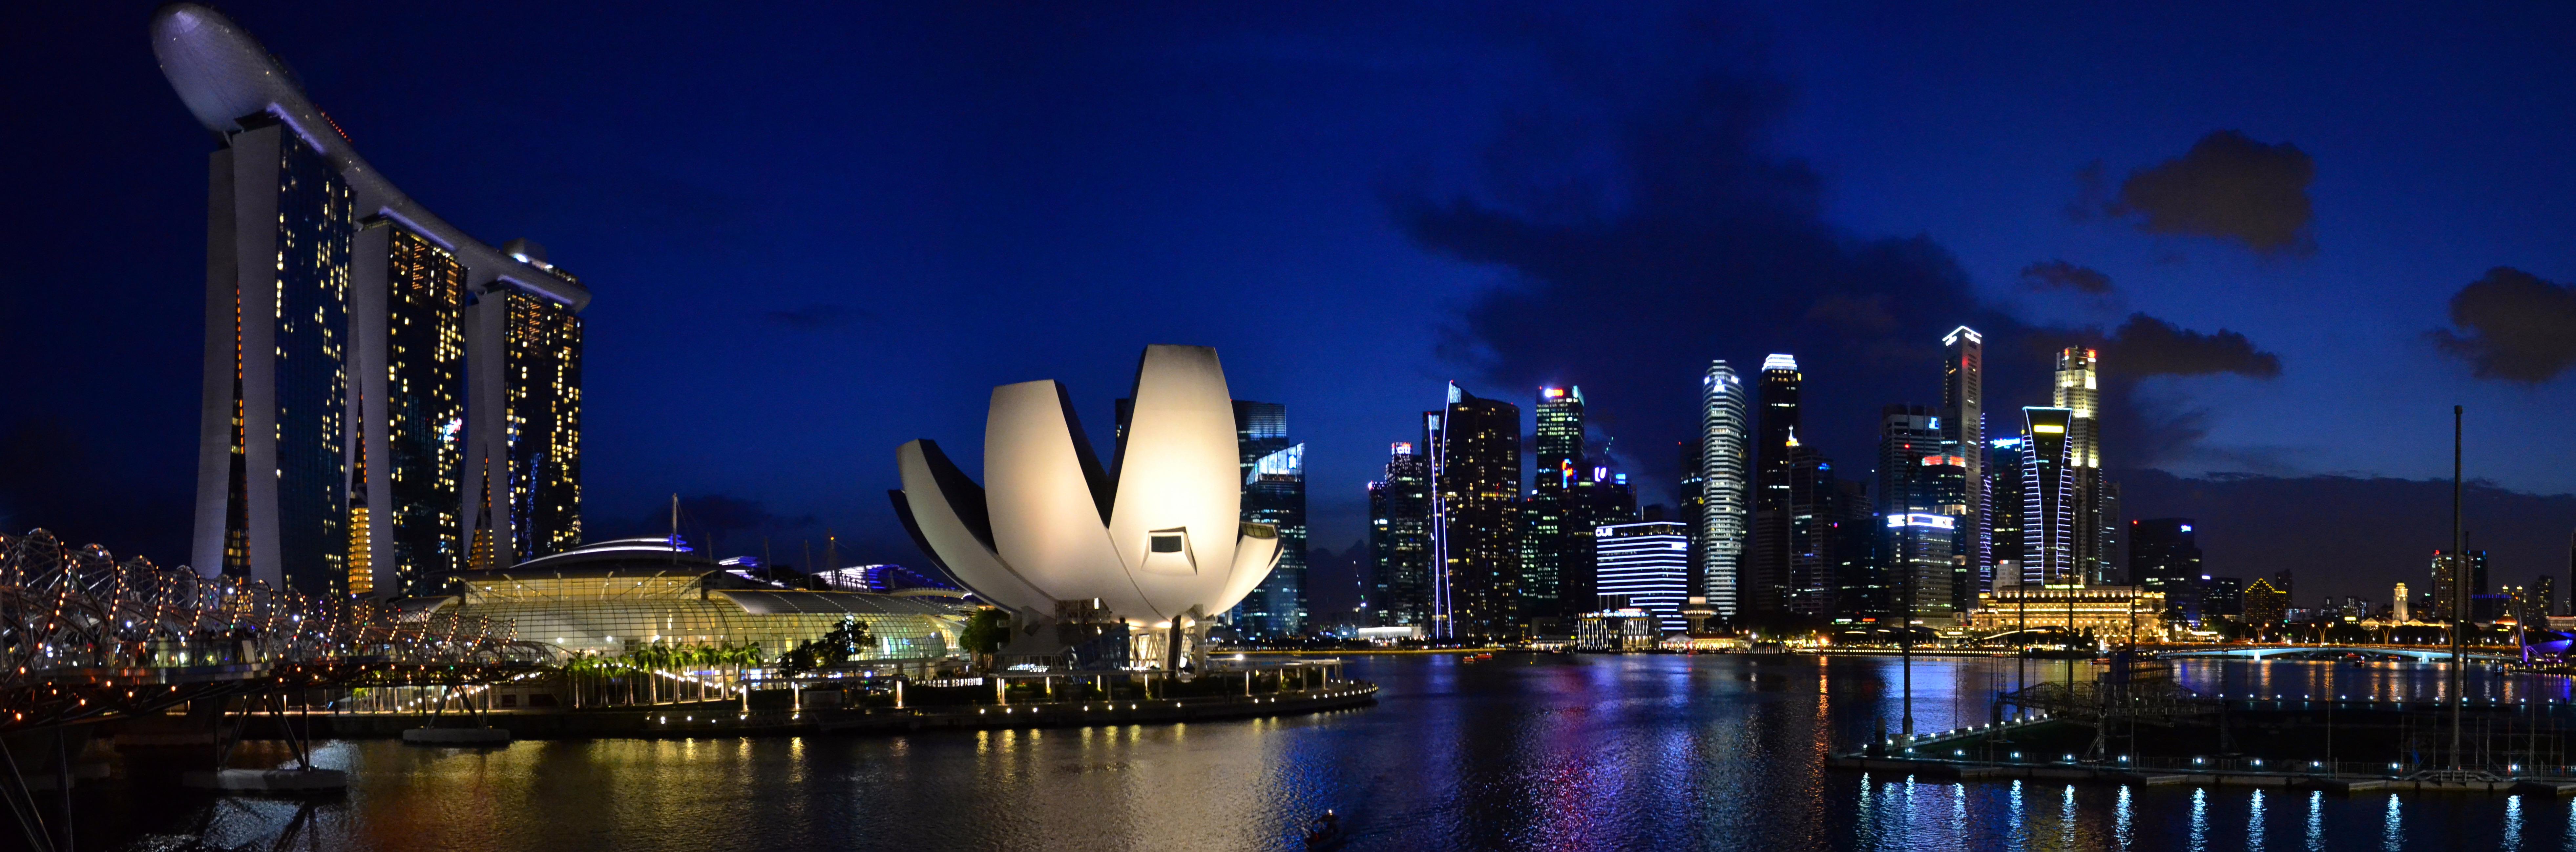 Stock Chart Singapore: Free stock photo of city city-challenge Marina Bay Sands,Chart